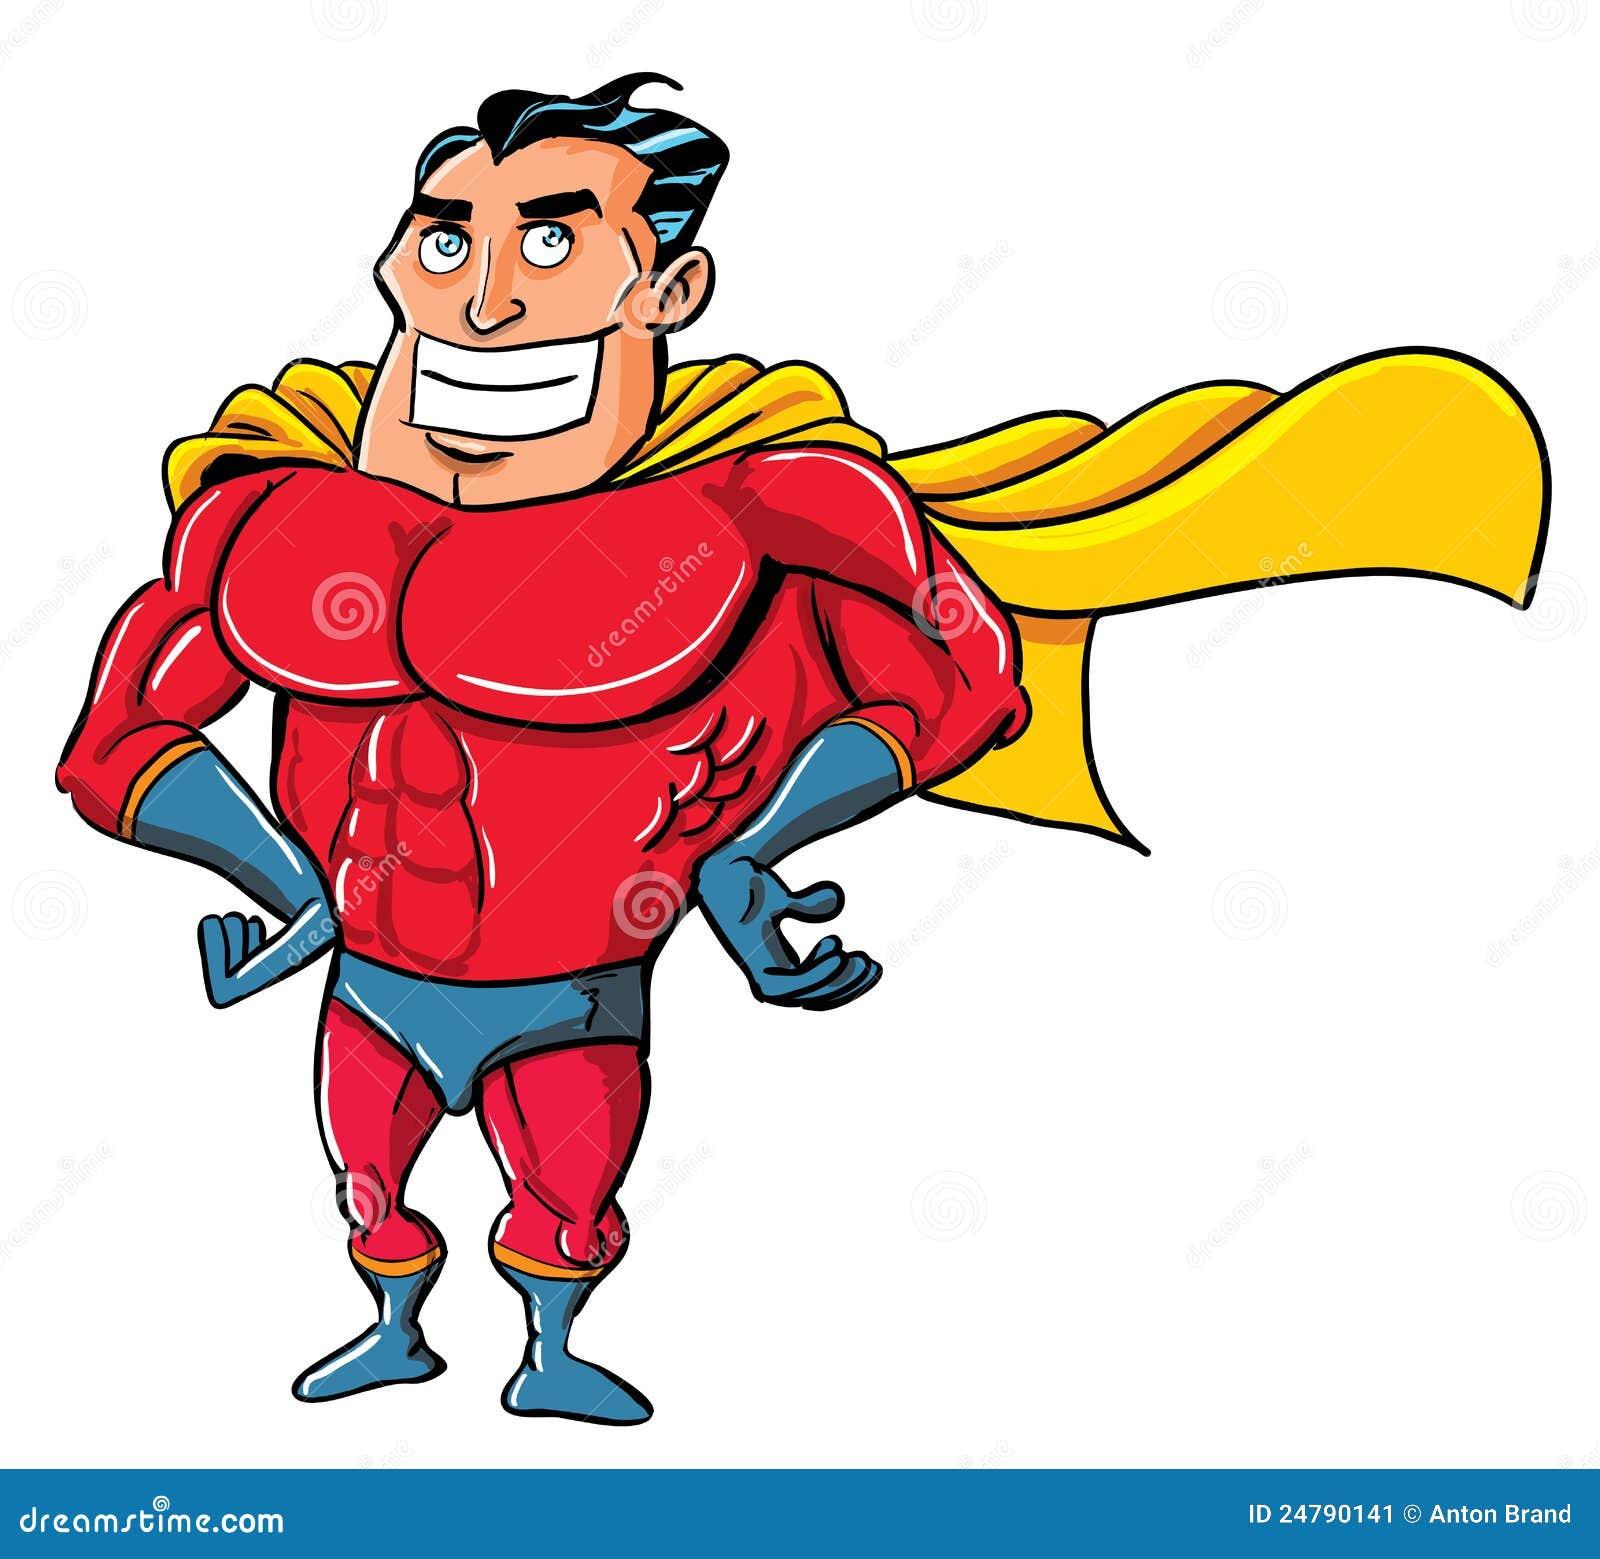 Superhero de dessin anim dans une pose classique - Superhero dessin ...